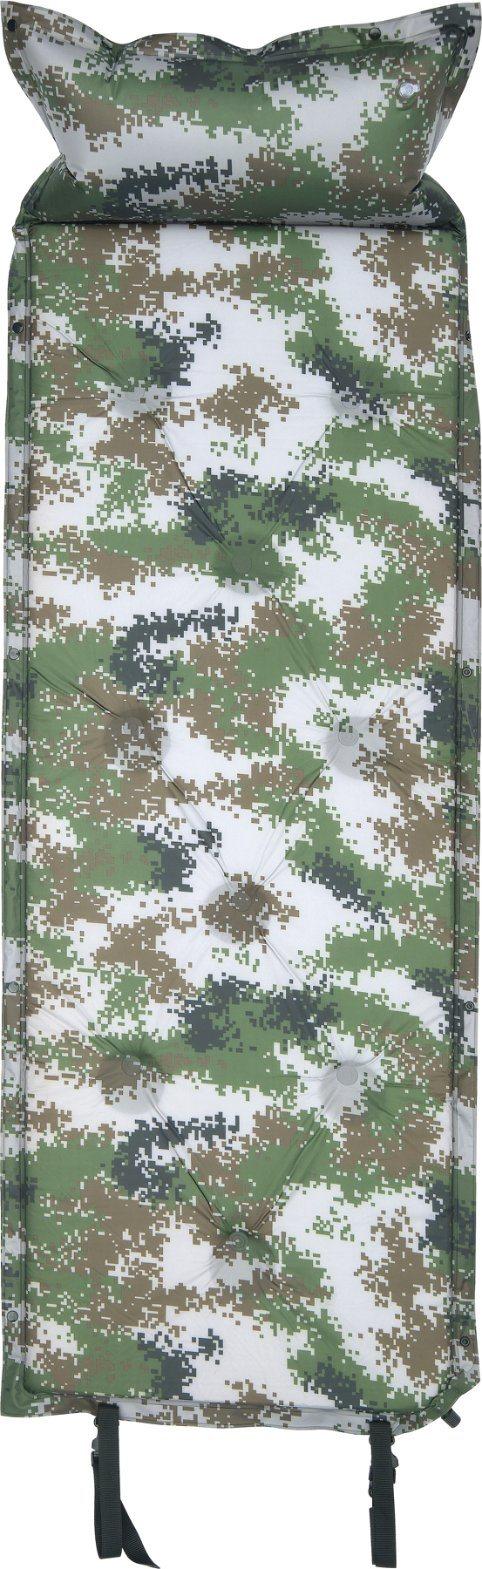 Military Army Green Waterproof Camping Self Inflatalbe Mattress